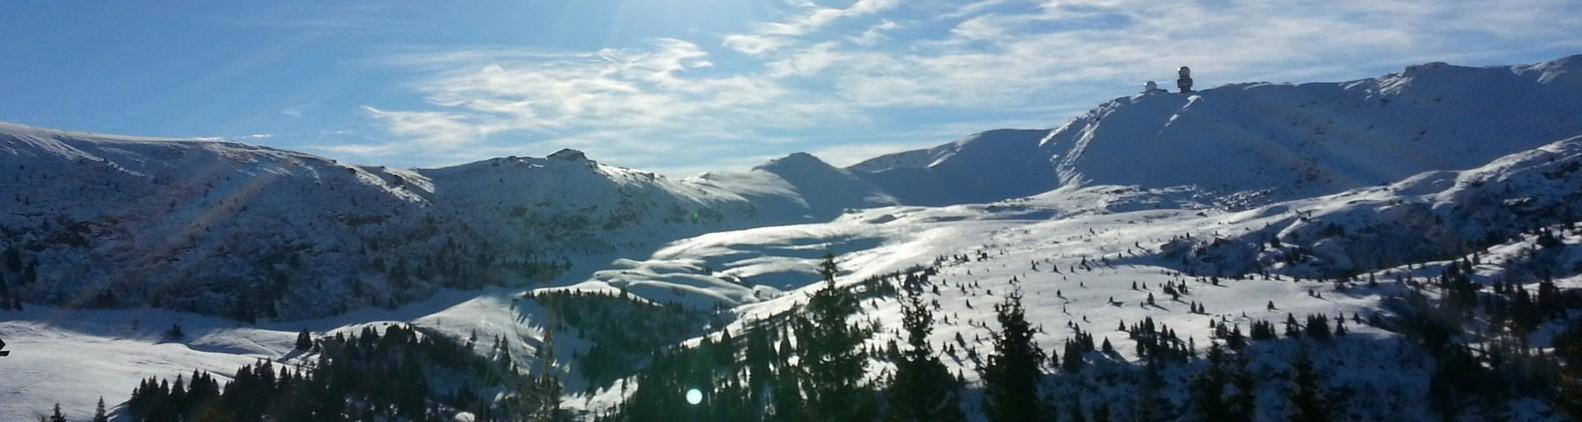 Pale Ski & Sport Gesellschaft m.b.H.